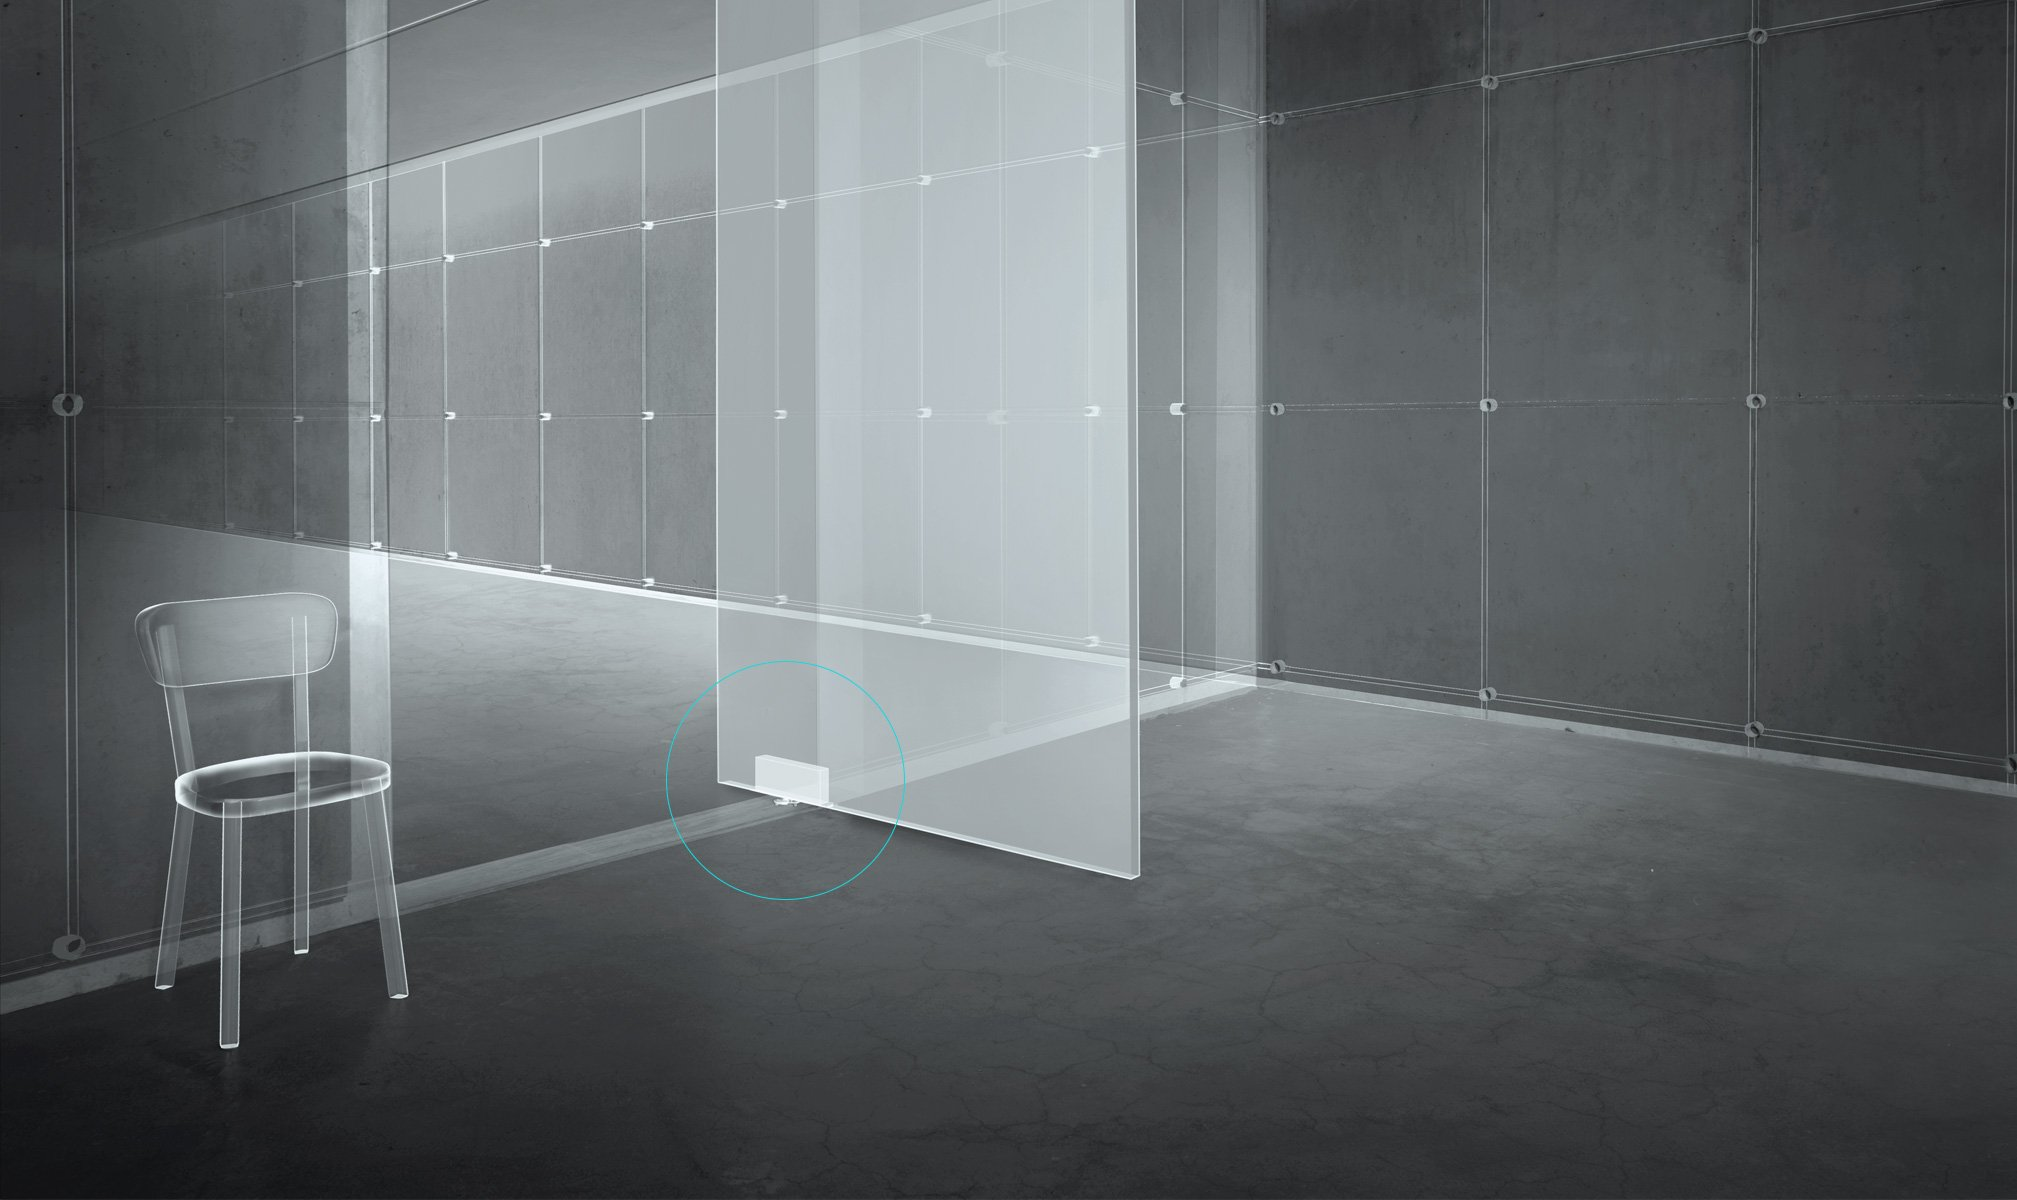 puerta-pivotante-con-bisagra-fritjurgens-abierta-x-ray-2.jpg